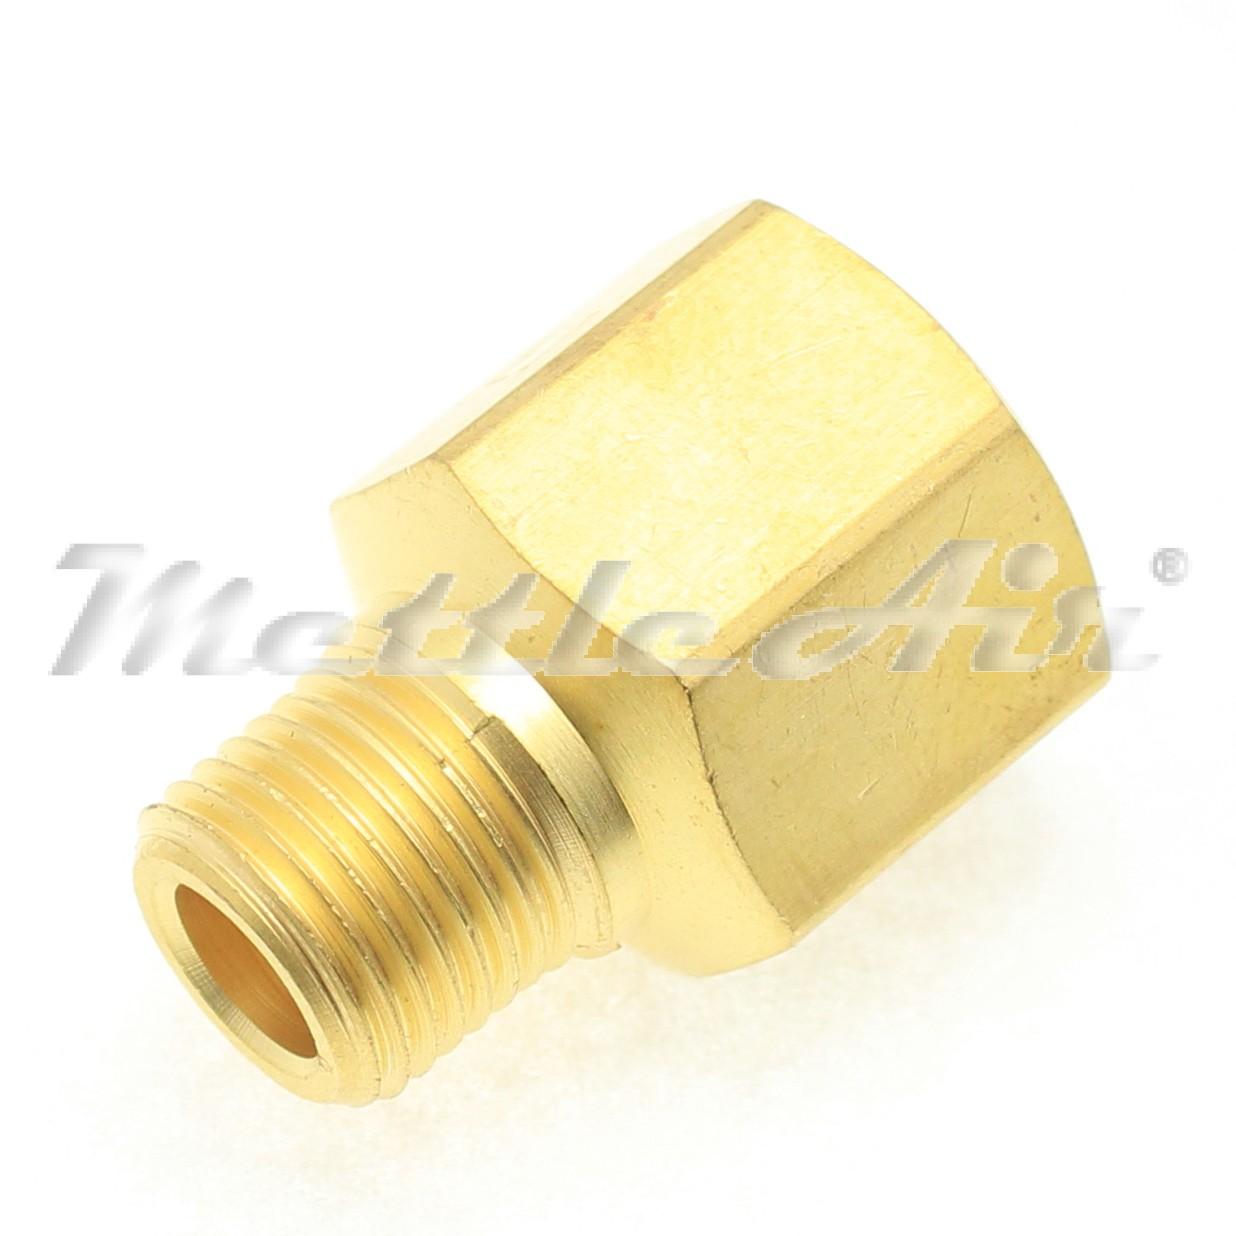 Brass pipe adaptor quot npt female male